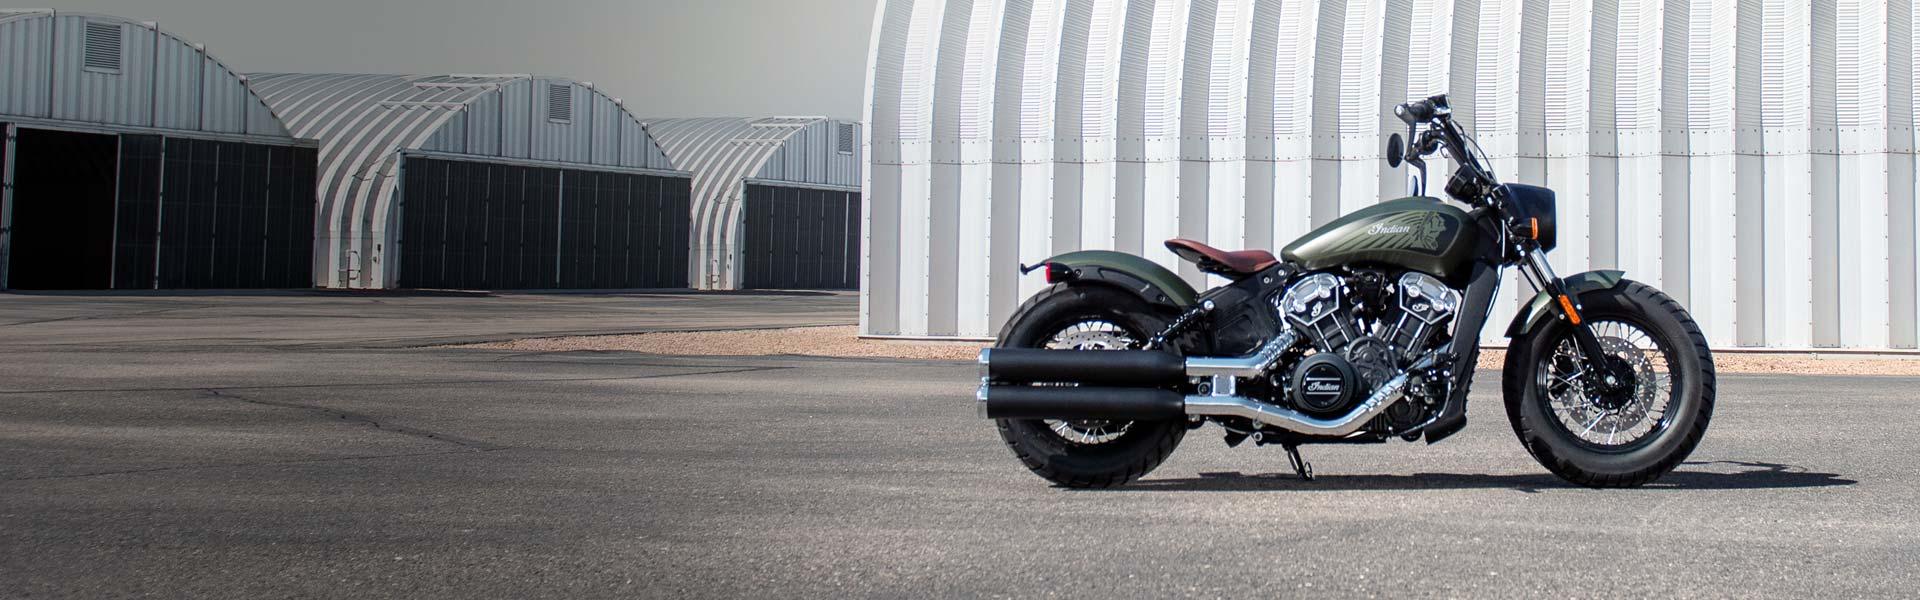 Scout Bobber Twenty Indian Motorcycle Maroc [ 600 x 1920 Pixel ]